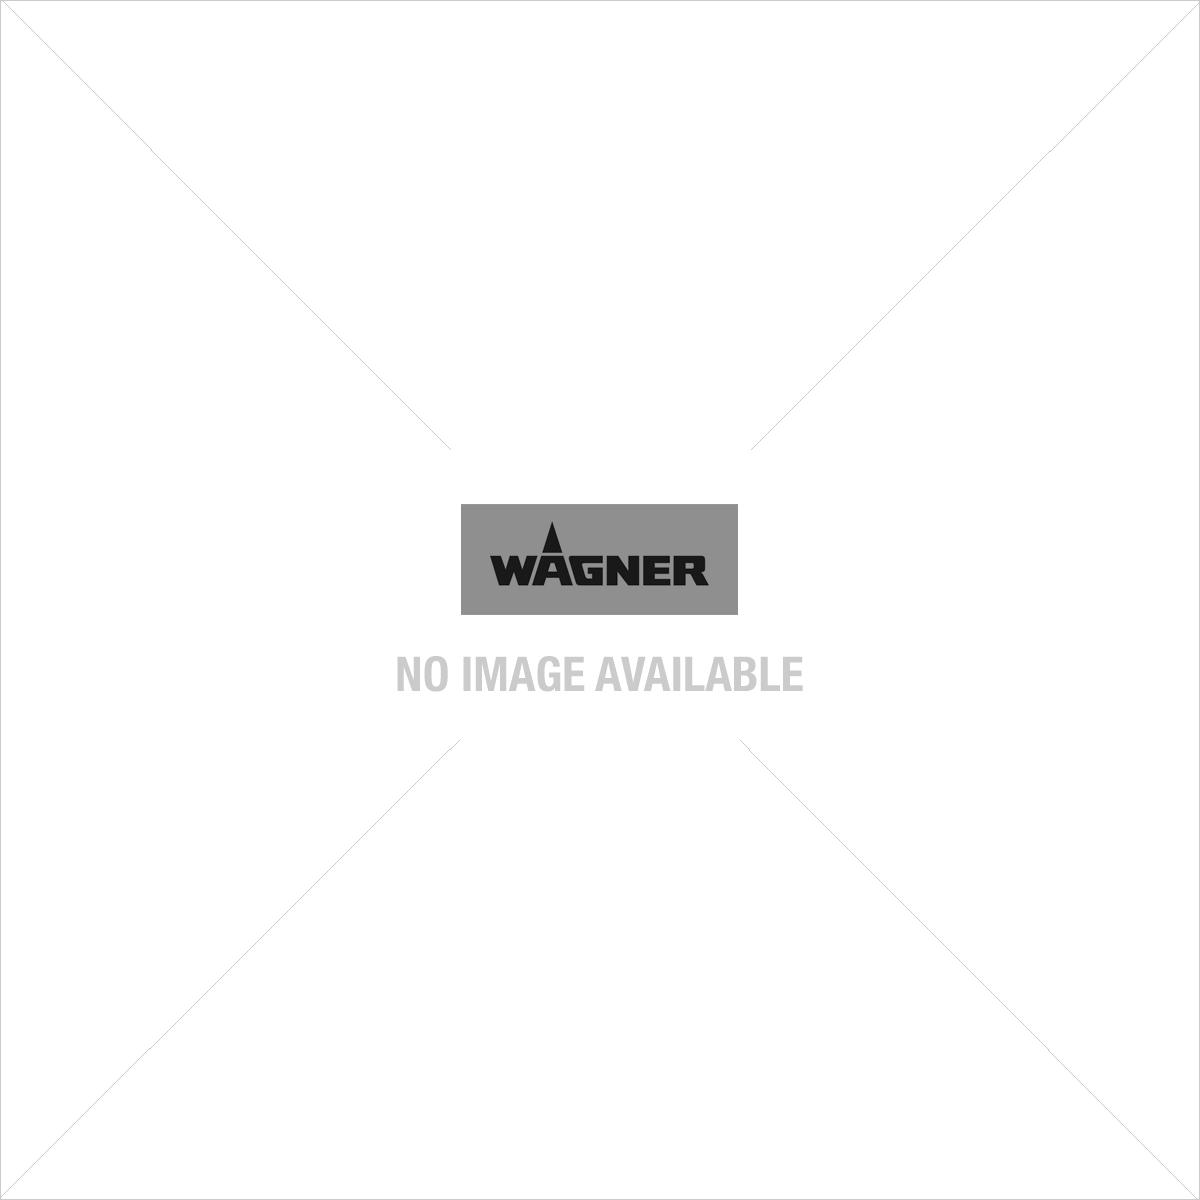 Wagner Wood & Metal Sprayer W 300 HVLP pistolet à peinture